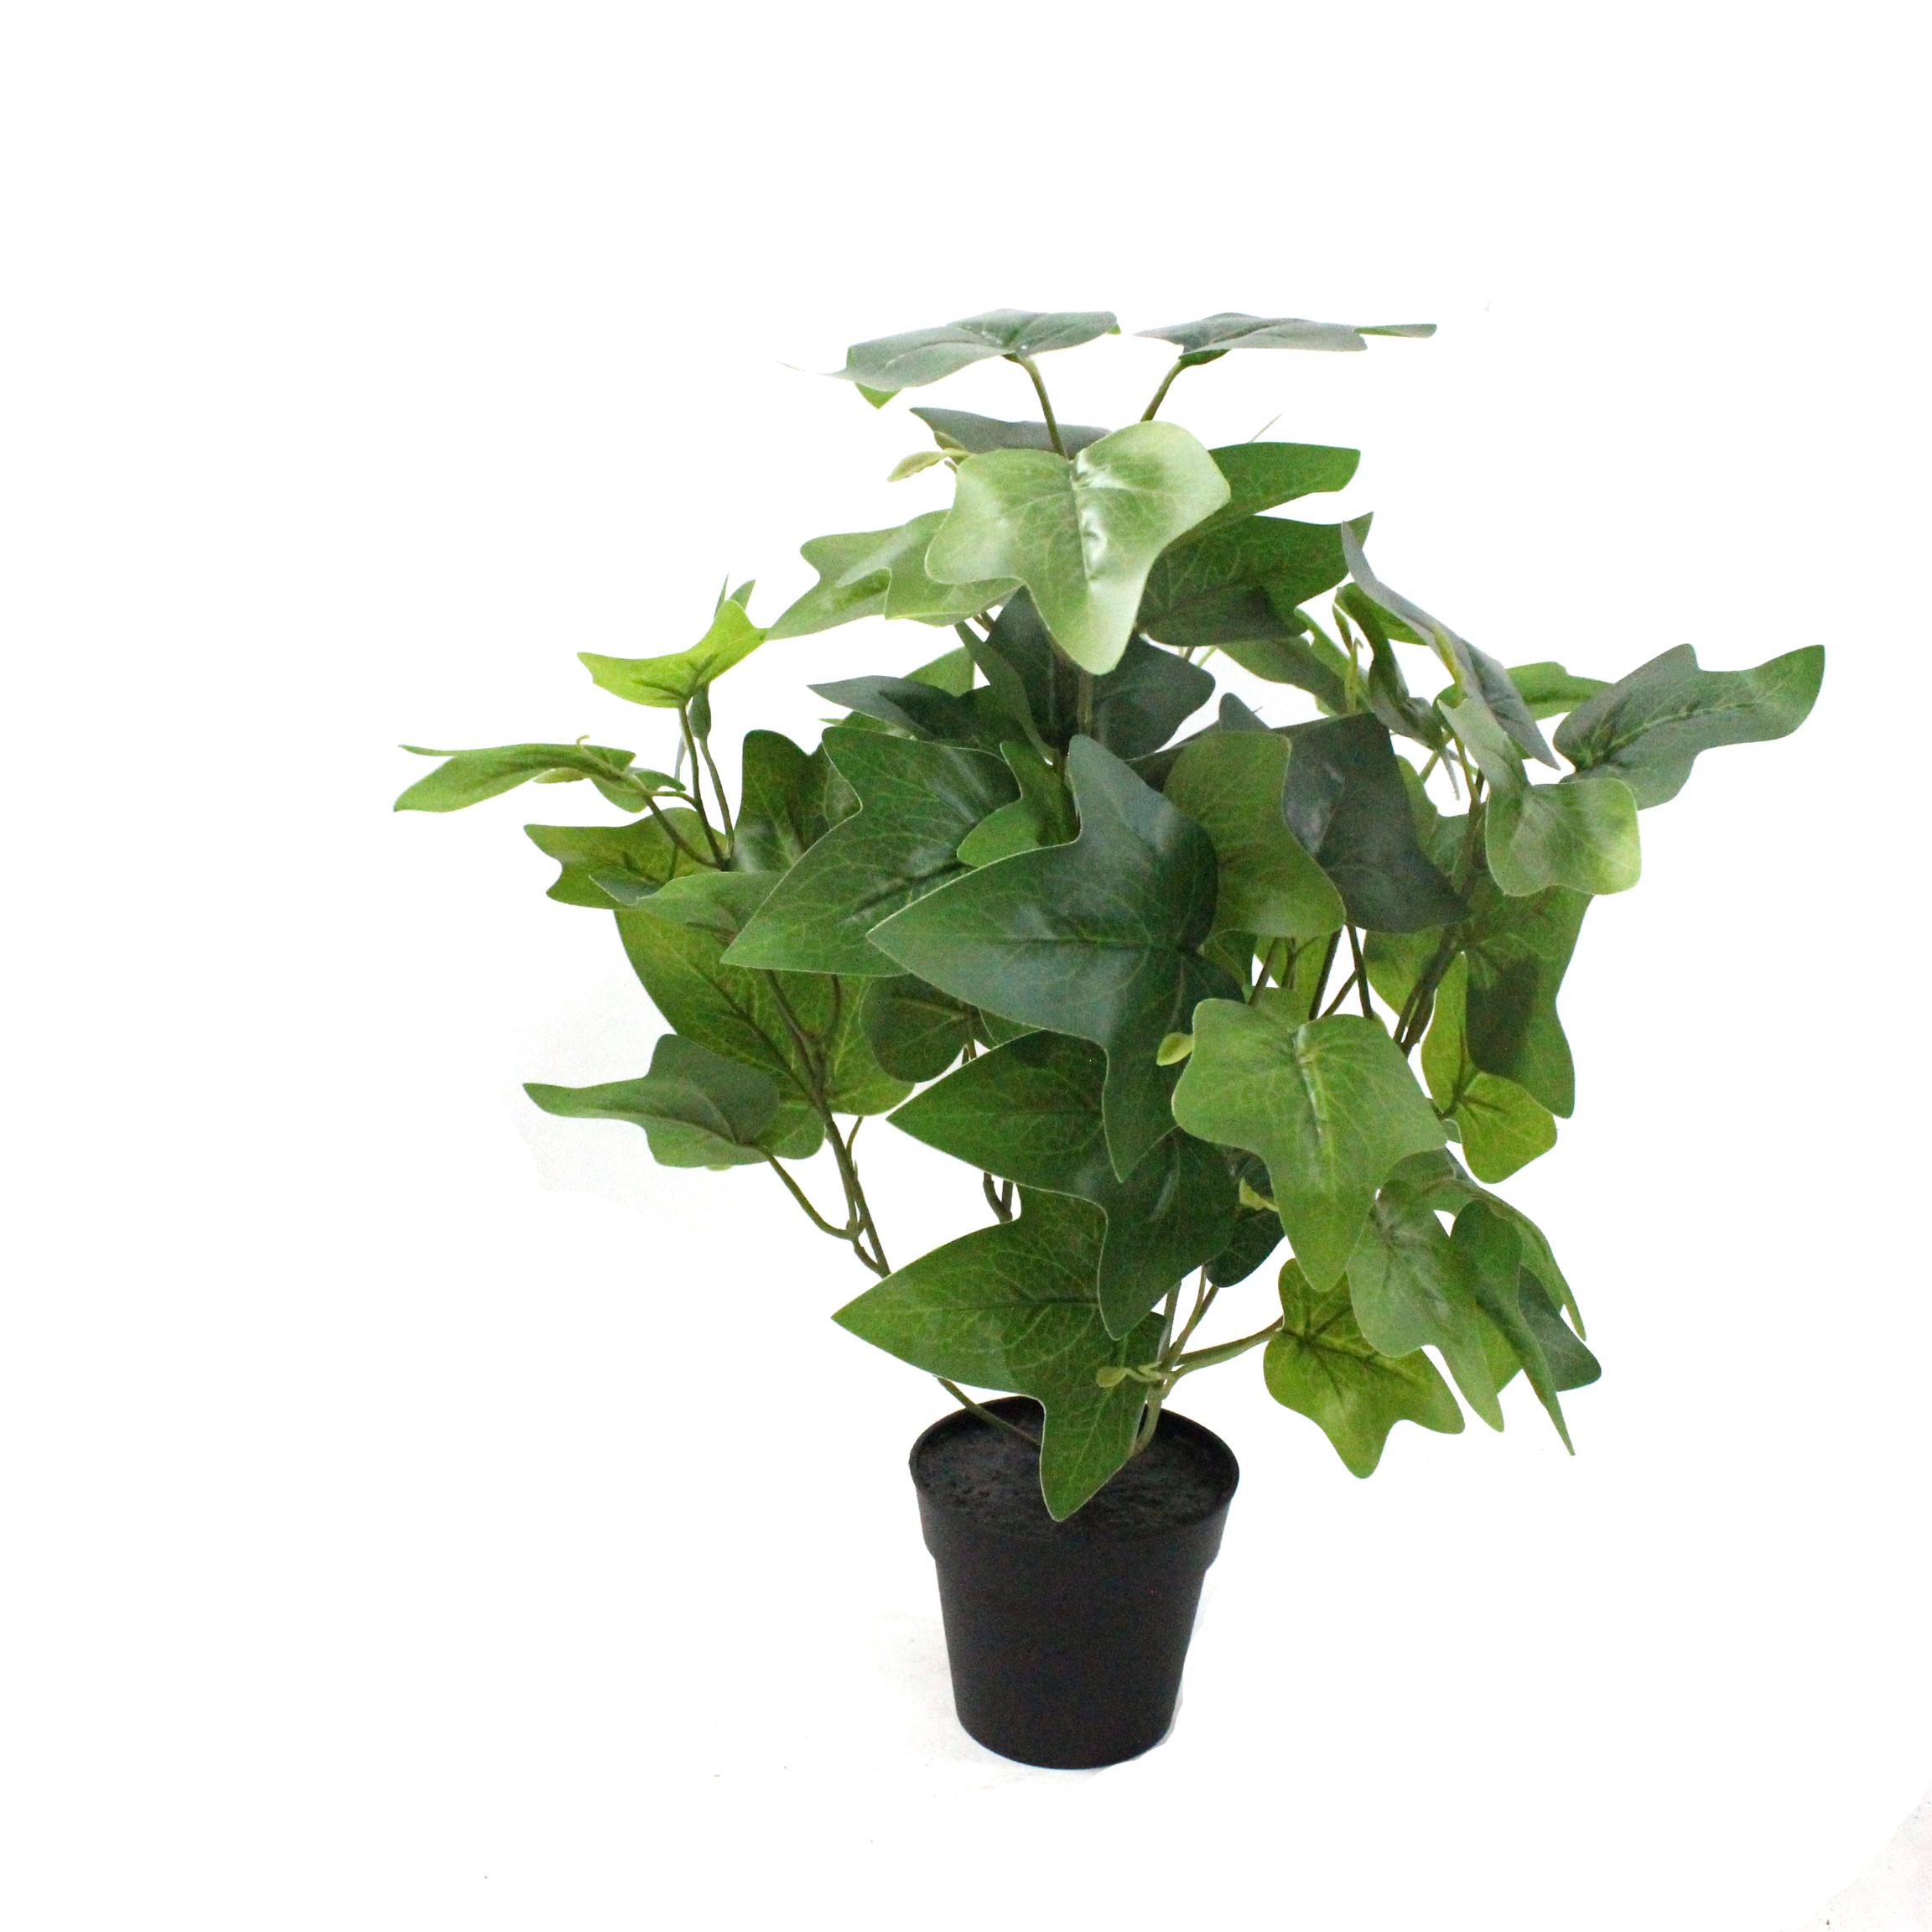 HX Artificial Plants Small Potted Table Decor Bouquet Tree Fake Plants Forks Bush Tree Foliage Branch Bonsai Plant